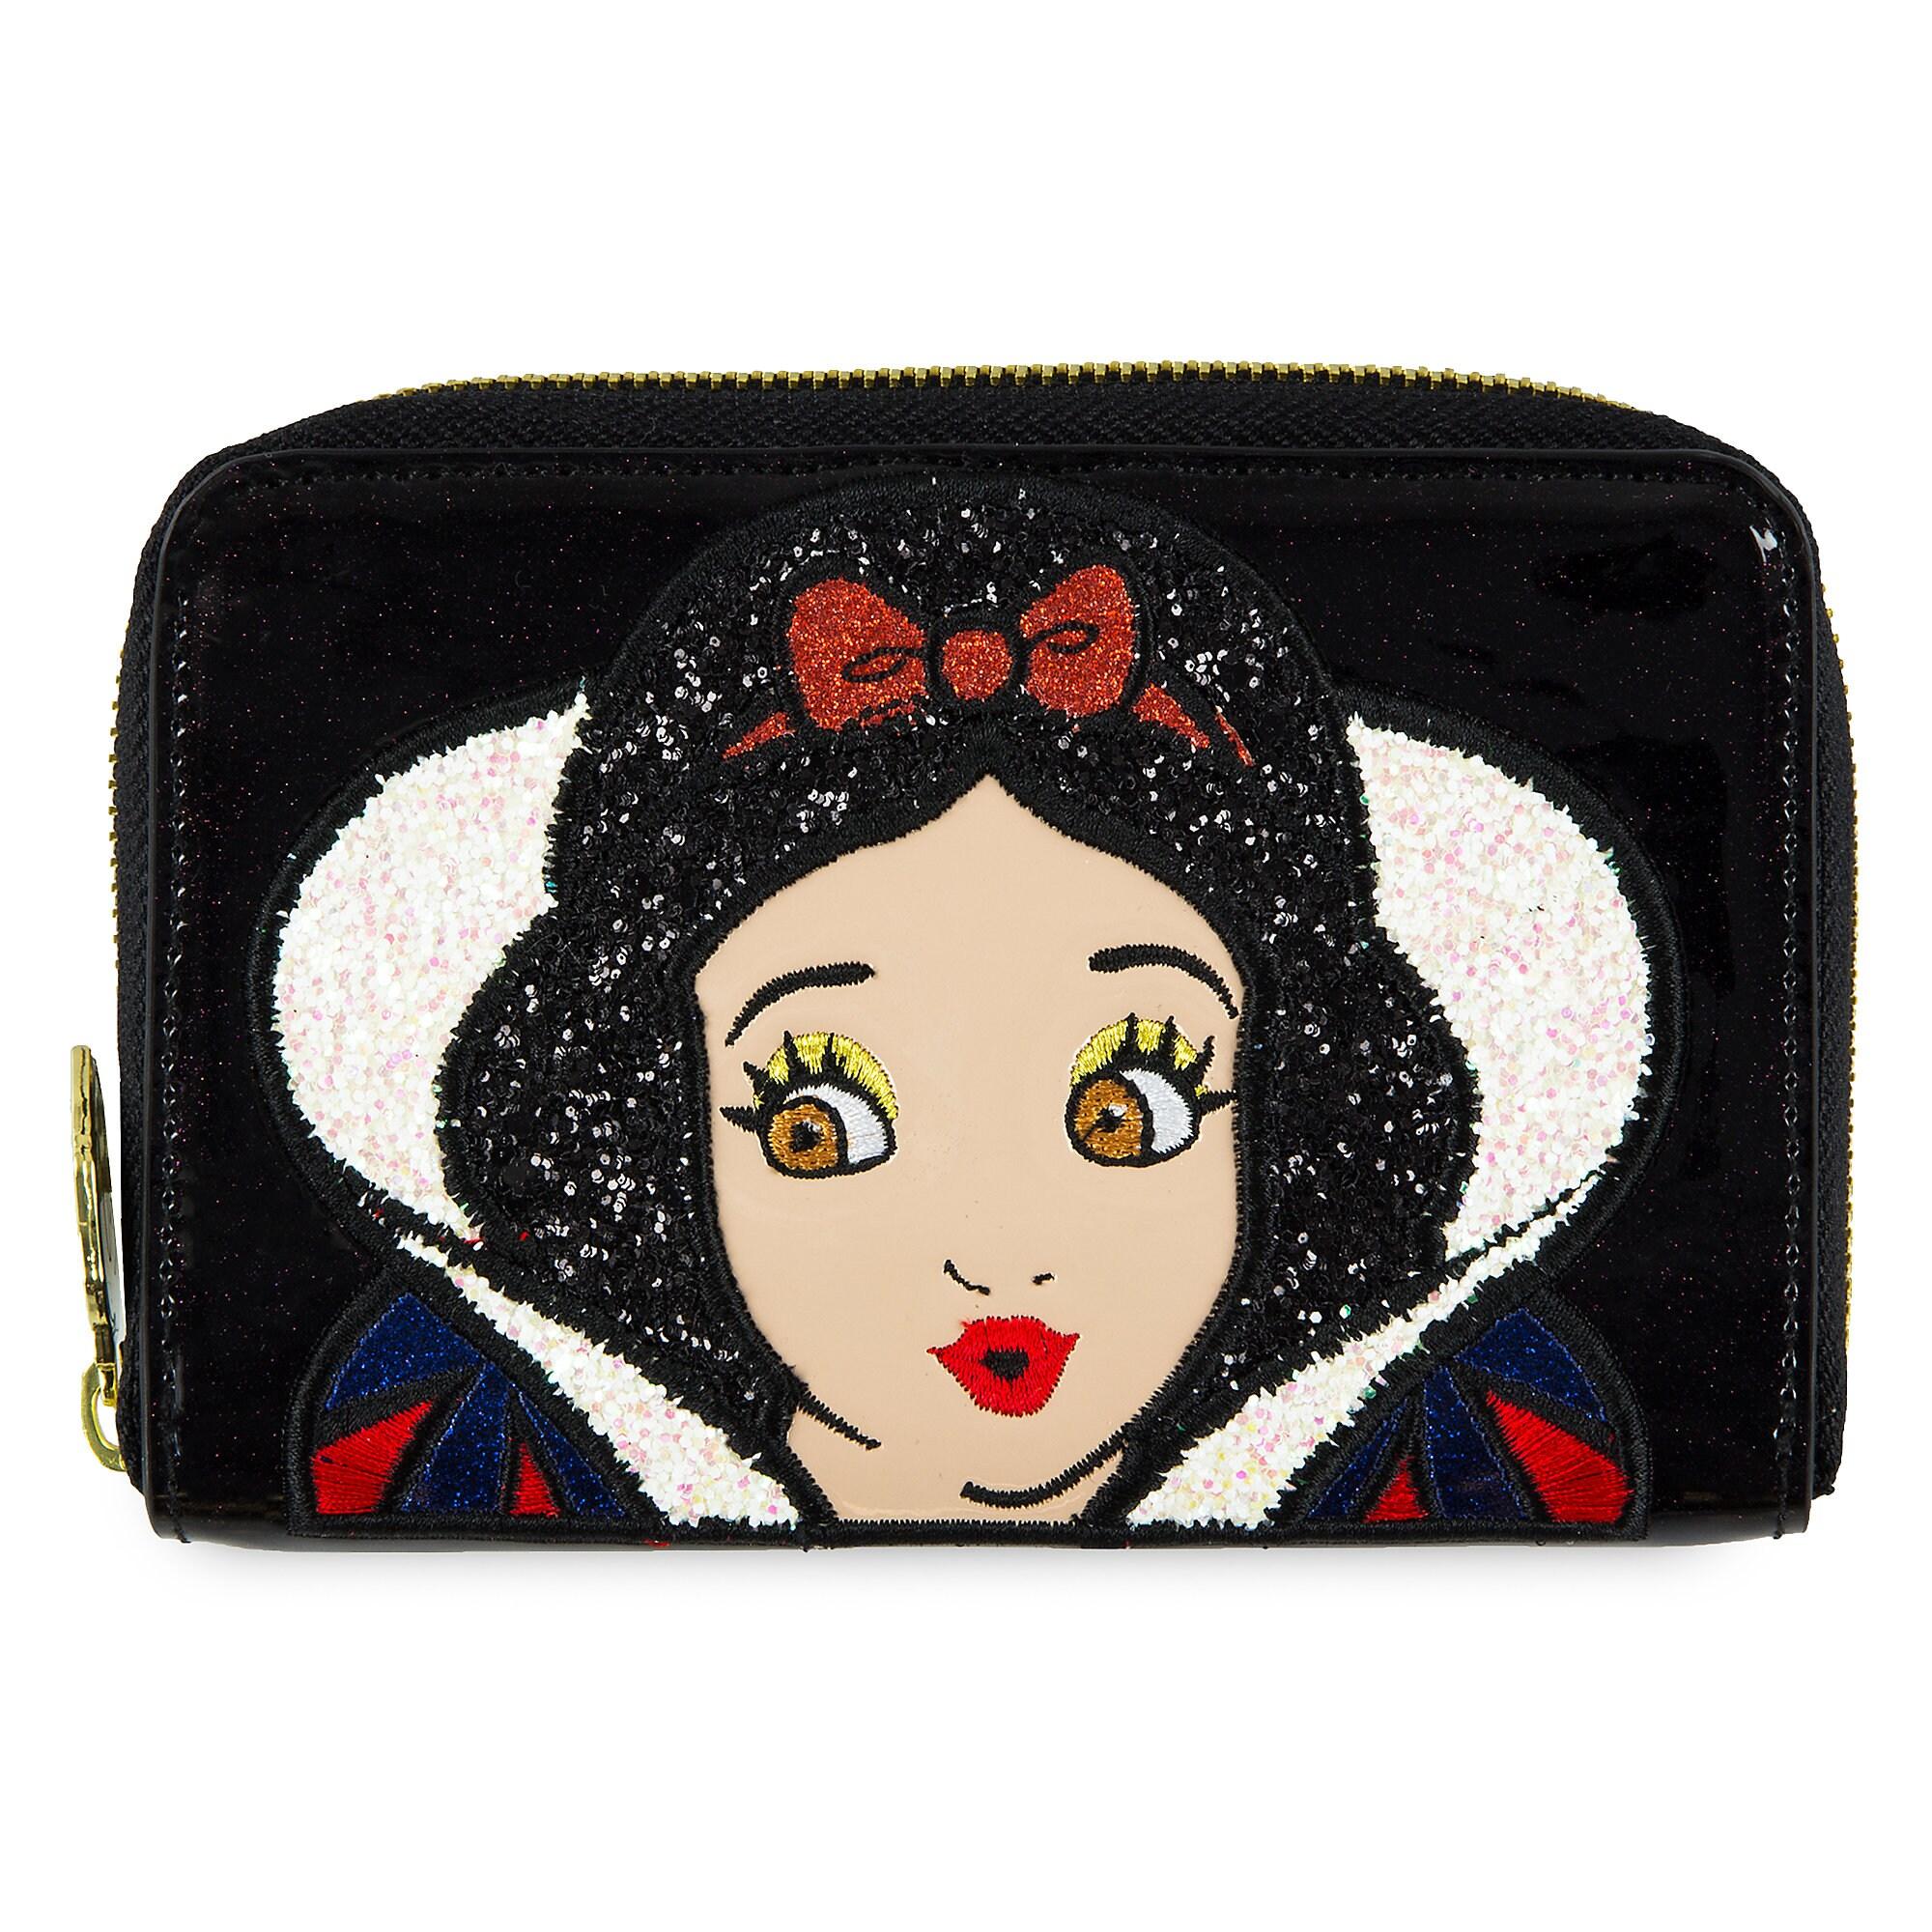 Snow White Wallet by Danielle Nicole